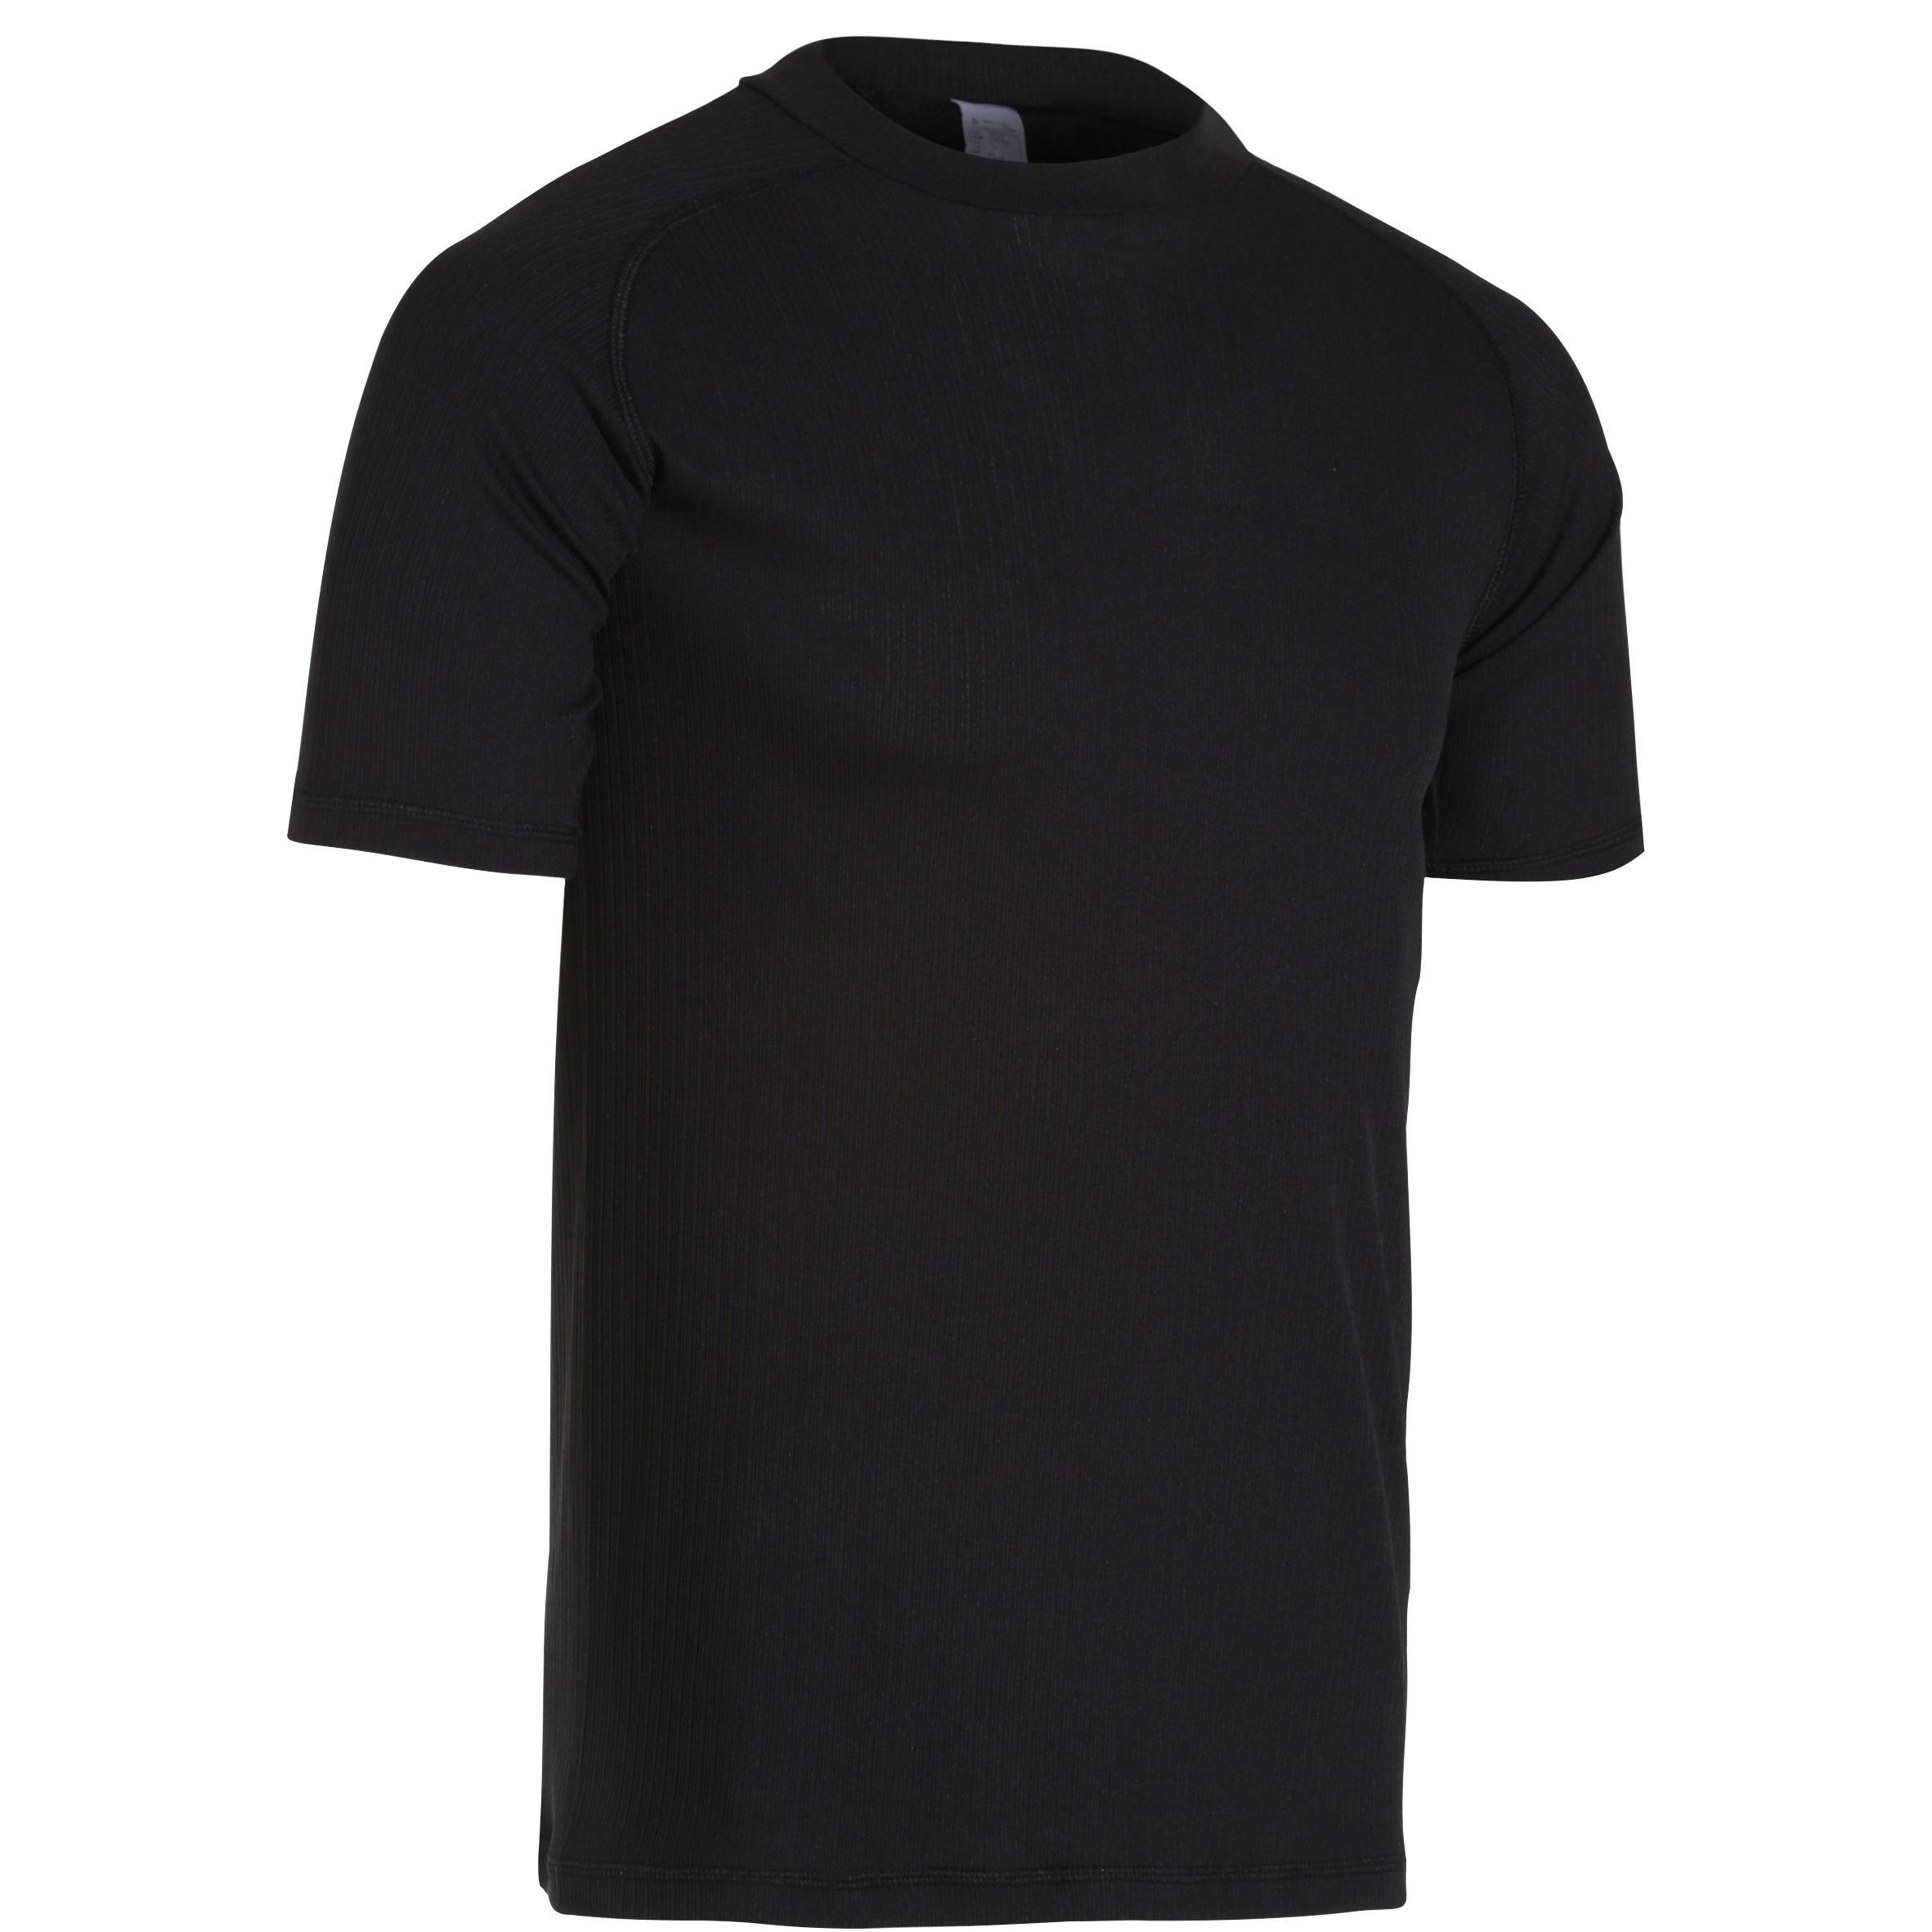 B'twin Fietsondershirt met korte mouwen 100 - Cool